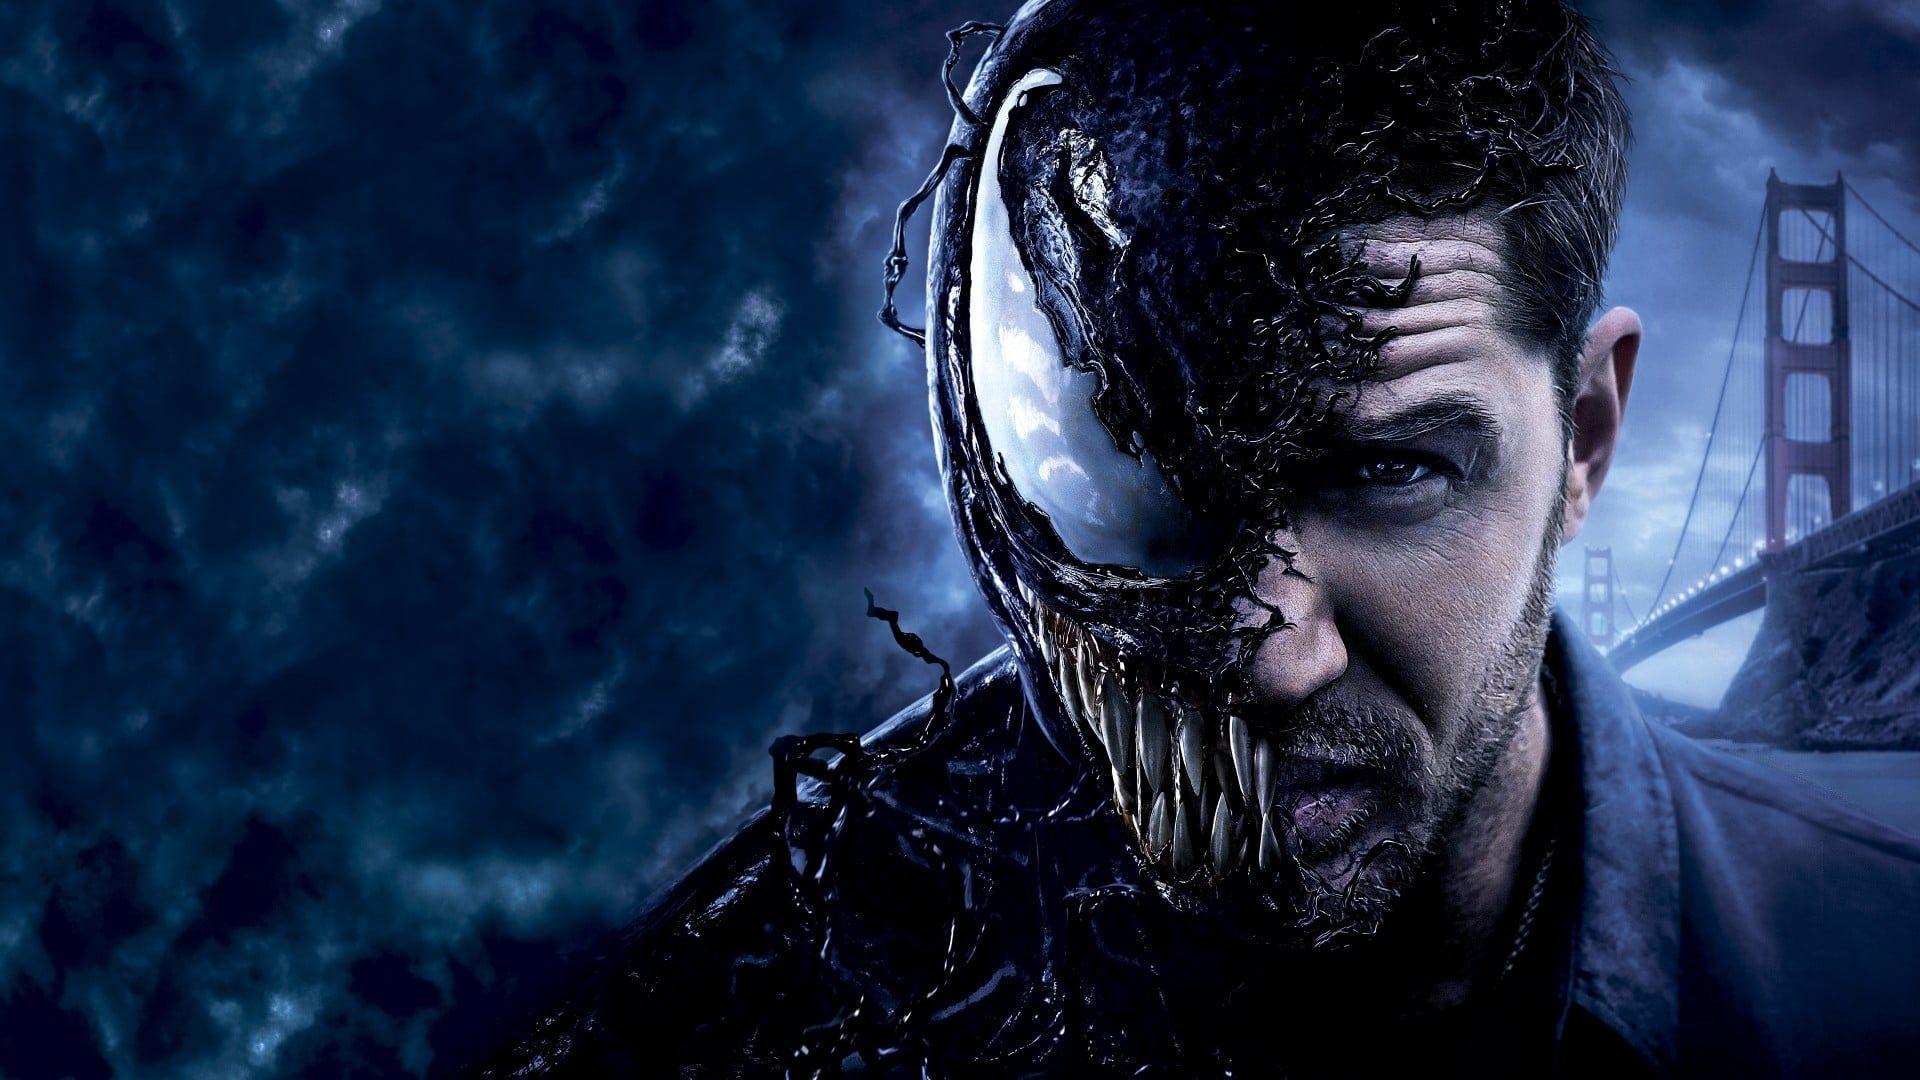 Venom Film Complet En Francais En Ligne Stream Complet Venom Hd